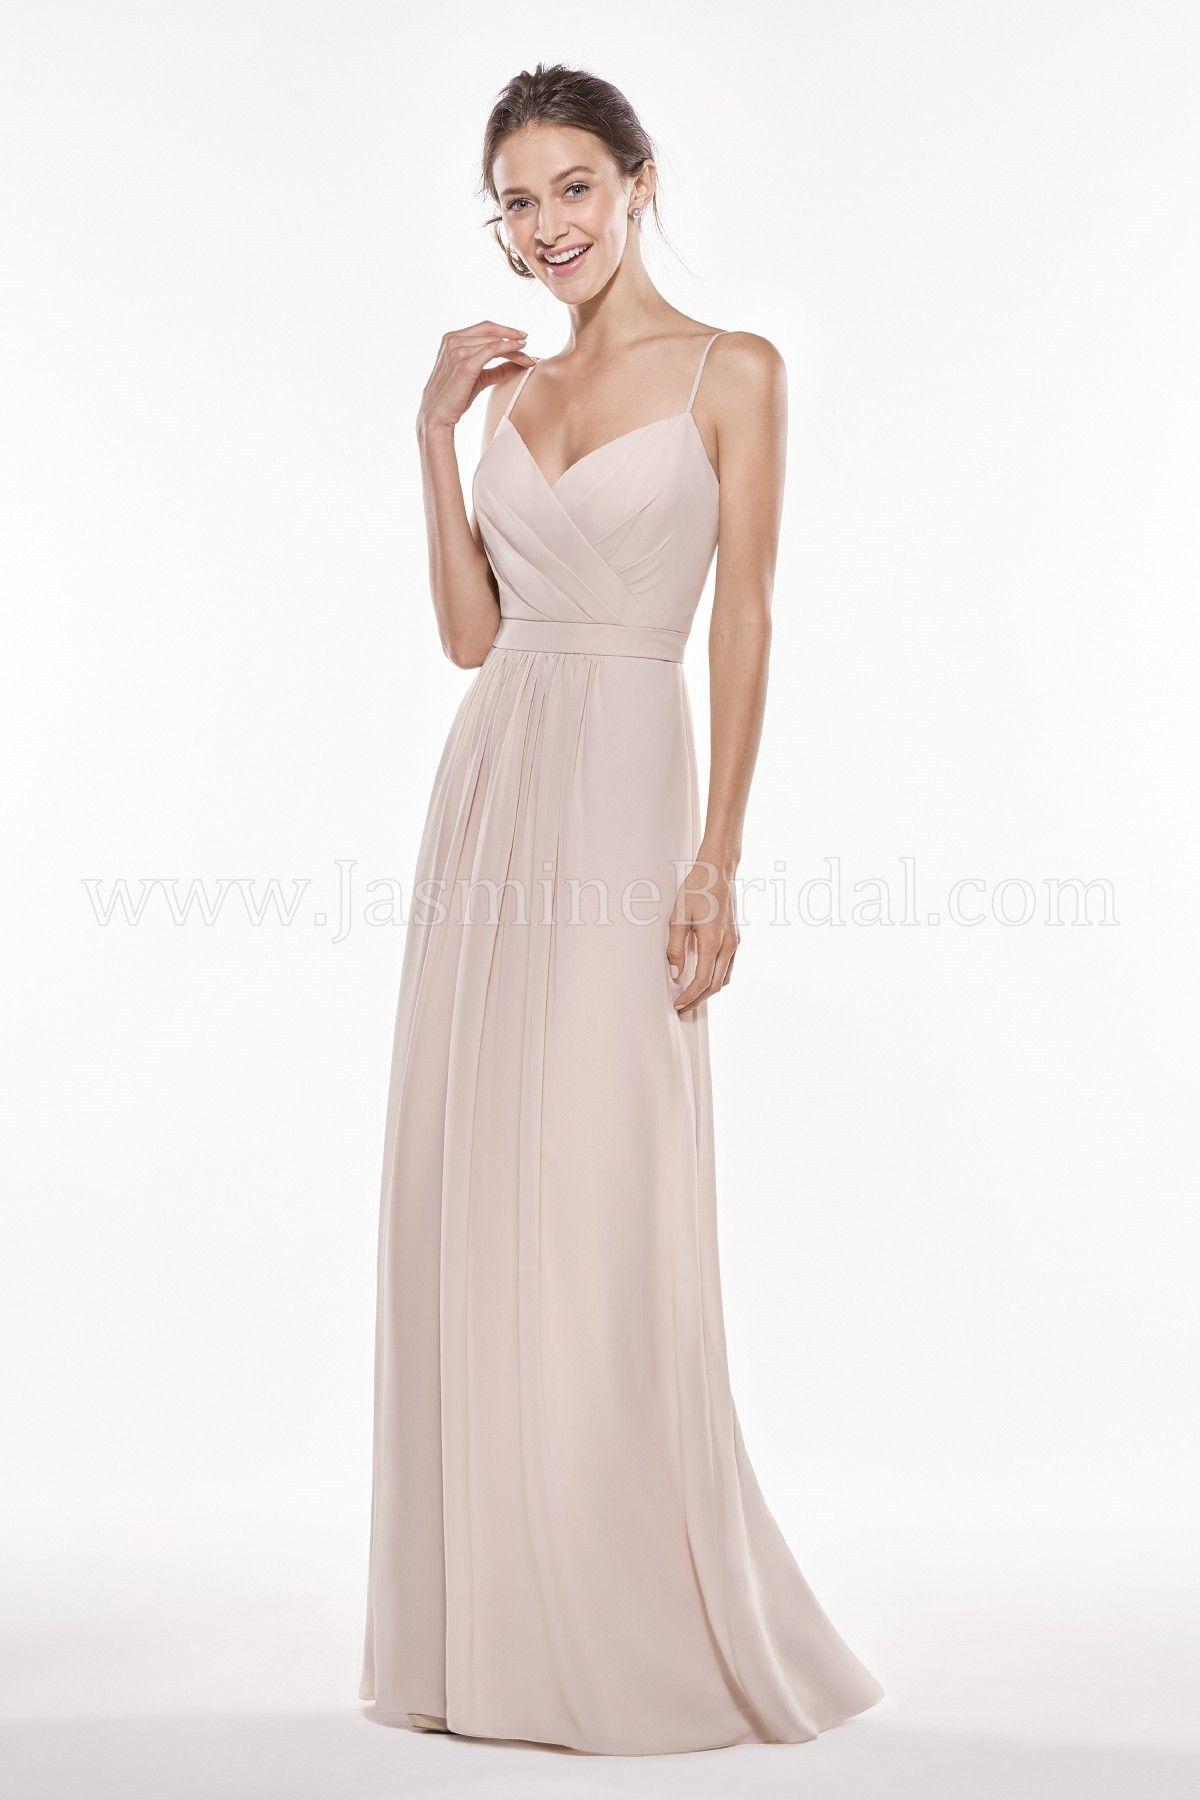 Jasmine Bridal - Jasmine Bridesmaids Style P196006 in Georgette ...